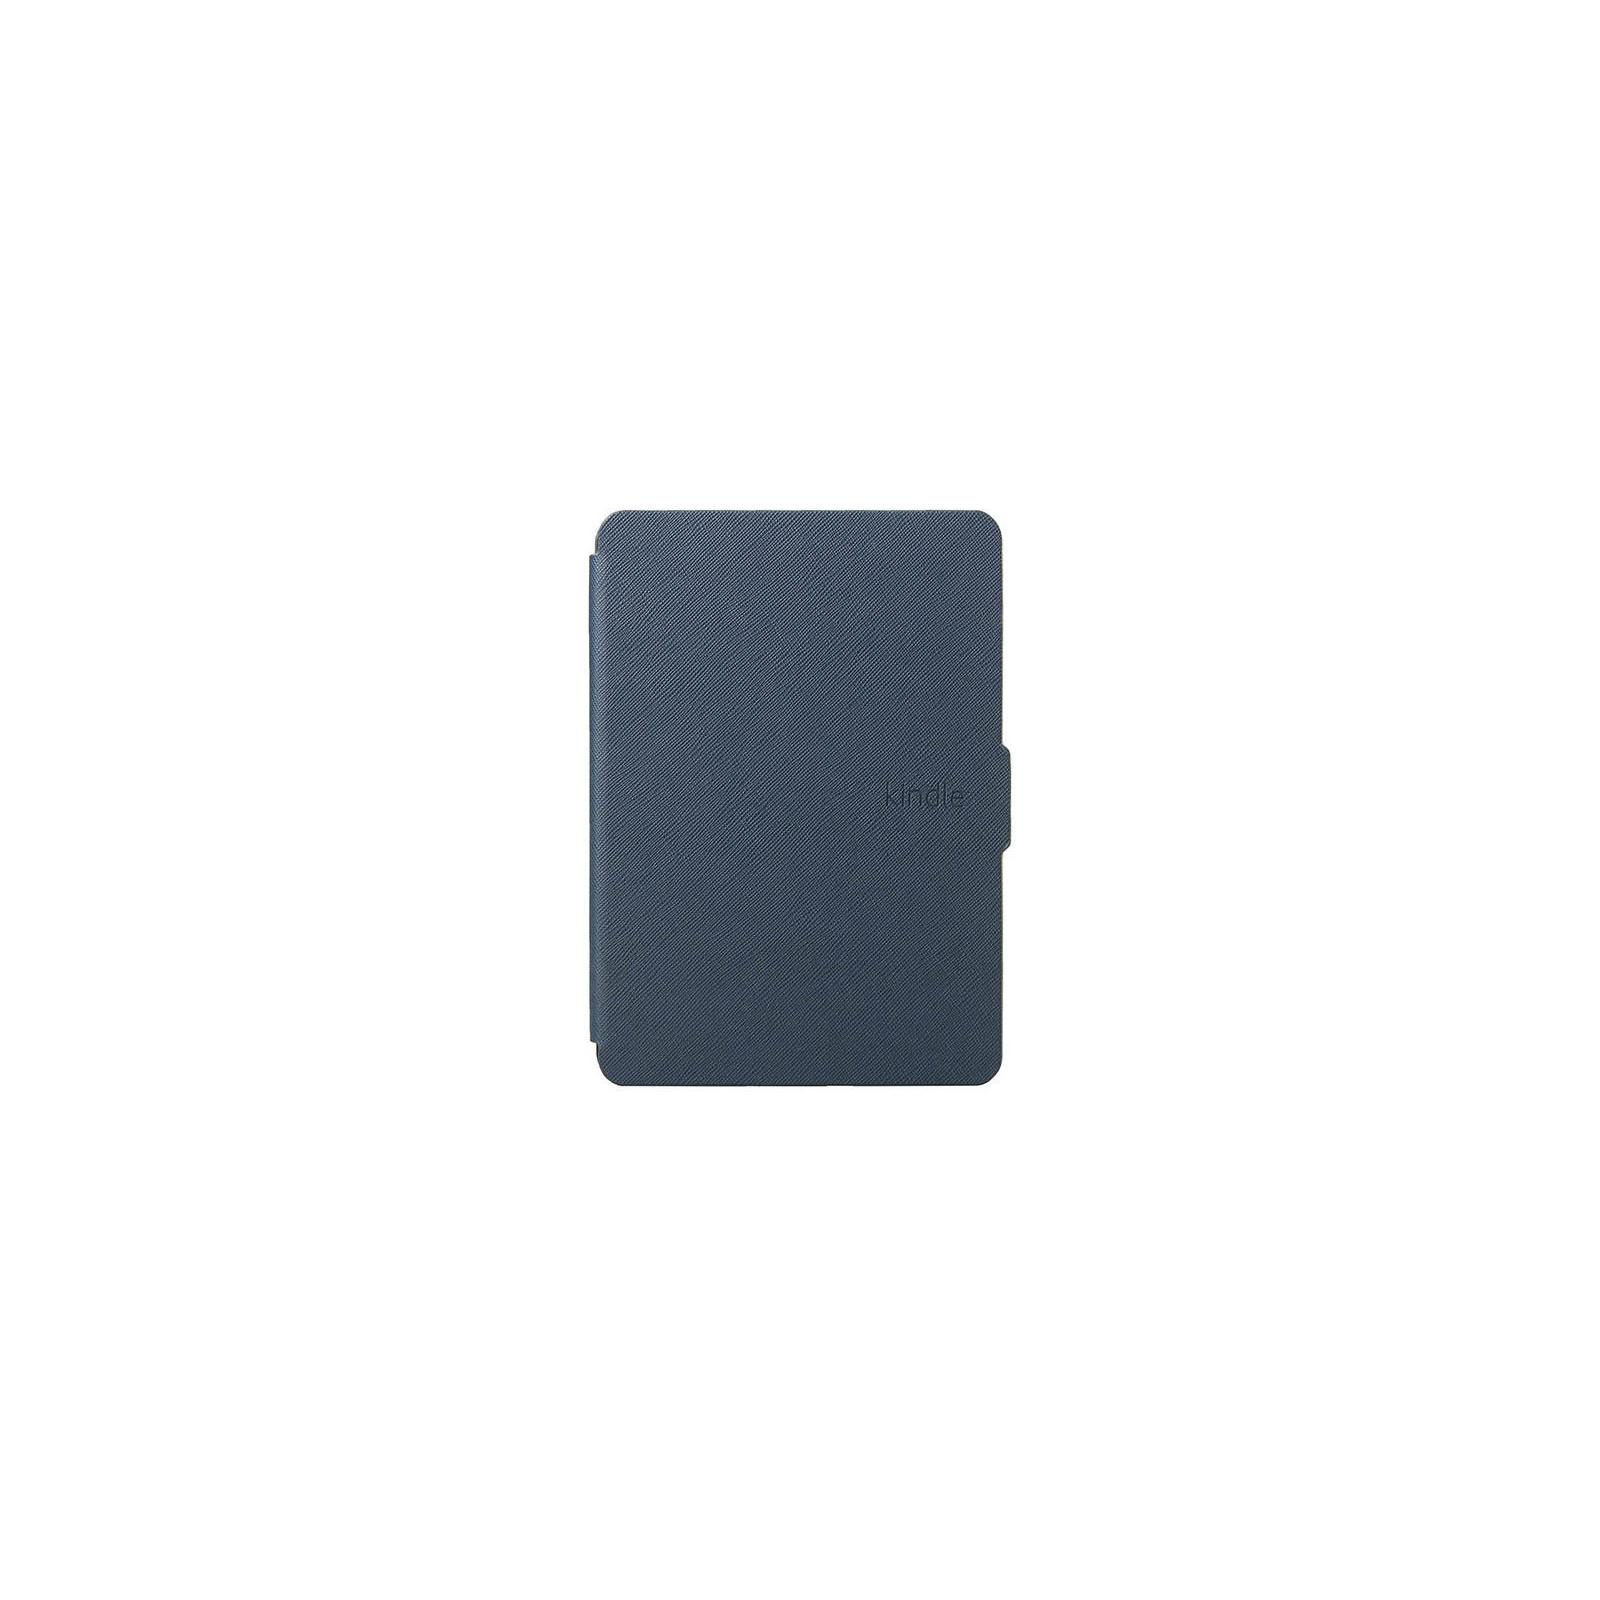 Чехол для электронной книги AirOn для Amazon Kindle 6 blue (4822356754493)